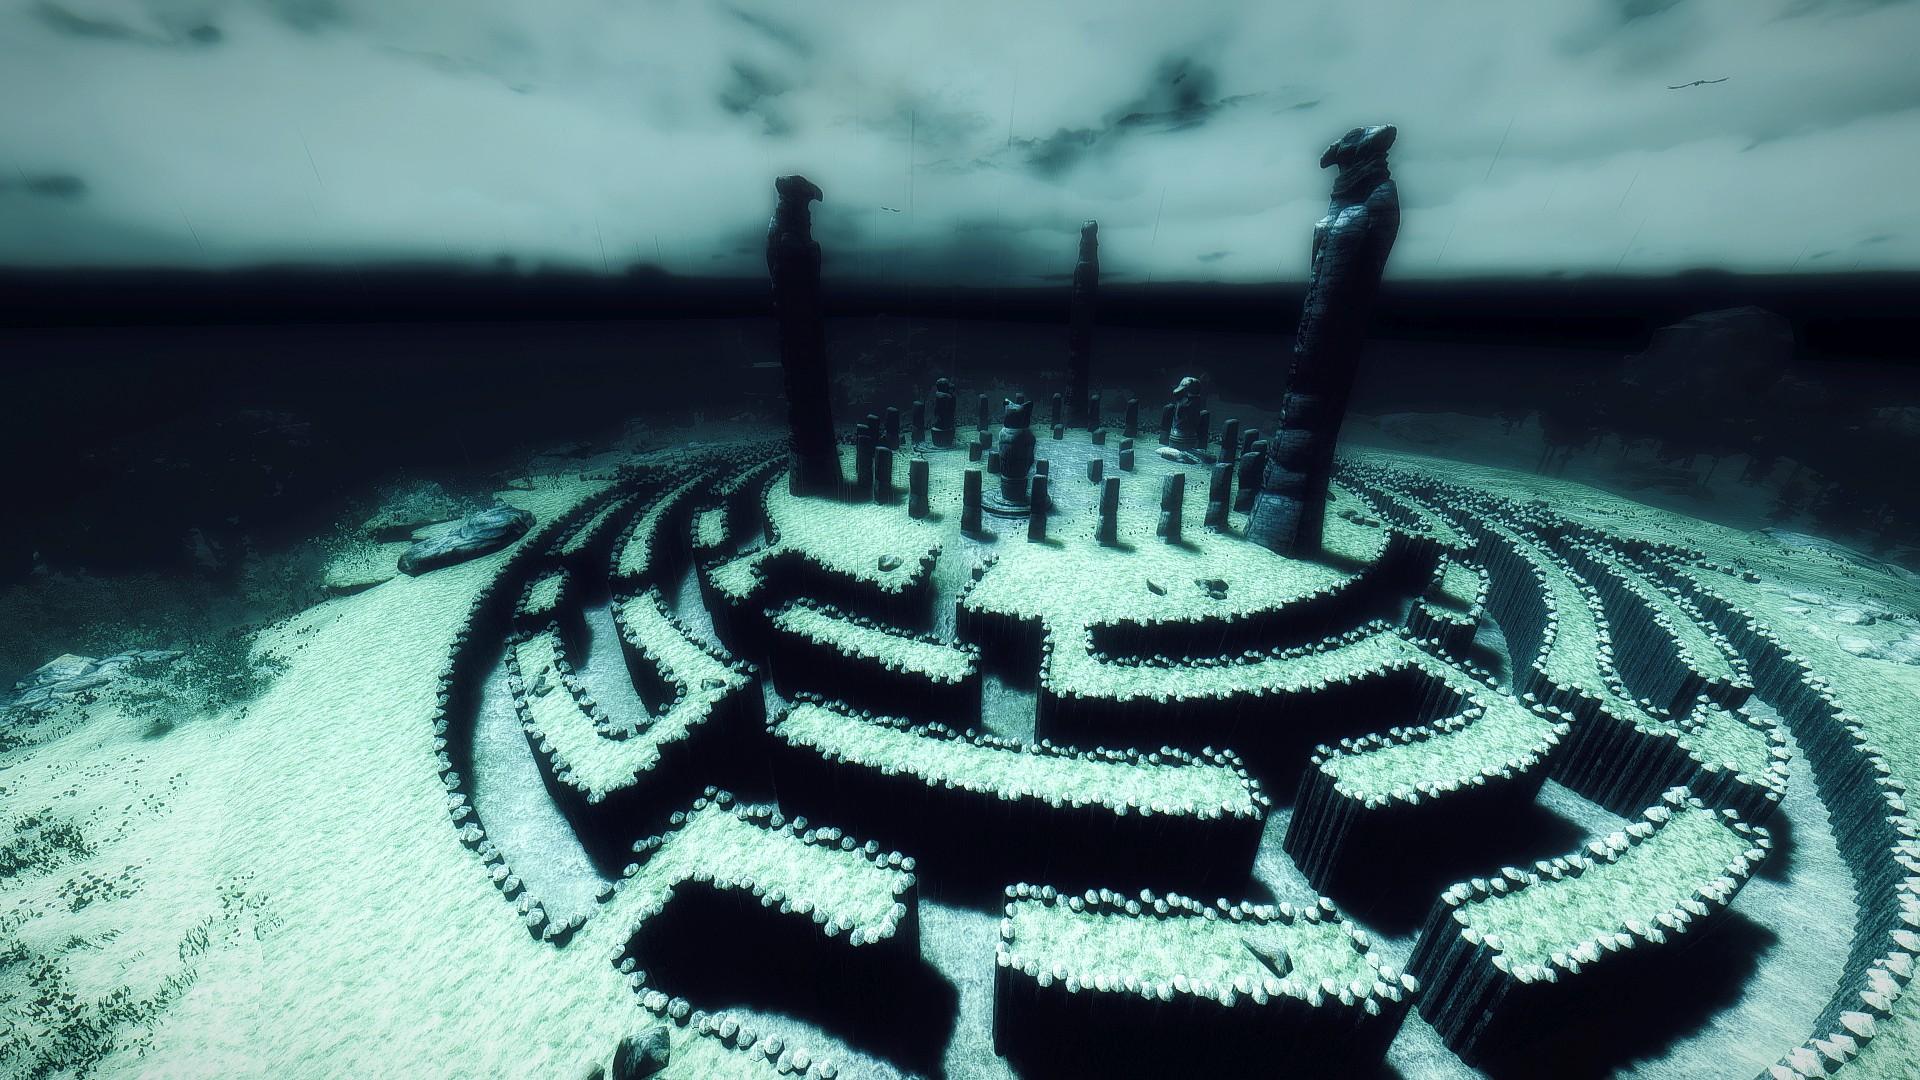 13b3467436366.jpg - The Elder Scrolls 5: Skyrim